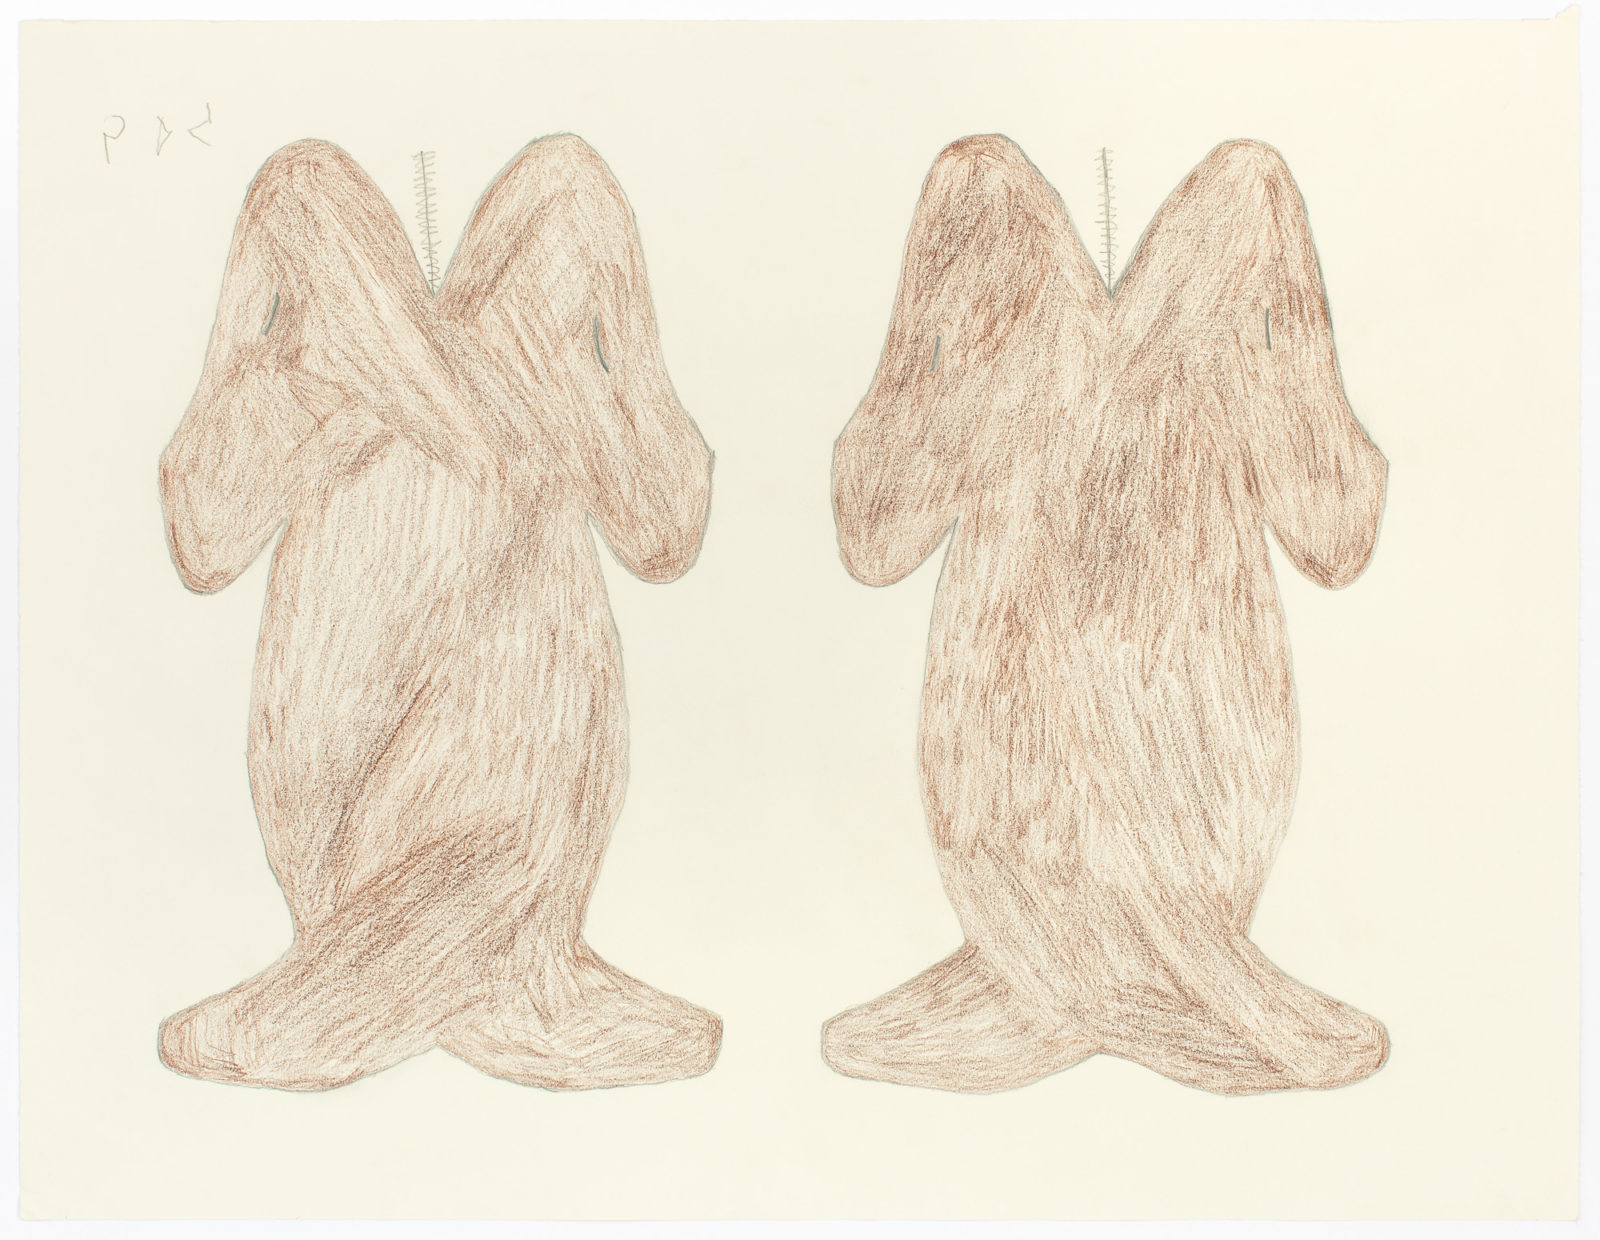 Sheojuk Etidlooie - untitled (two narwals brown)